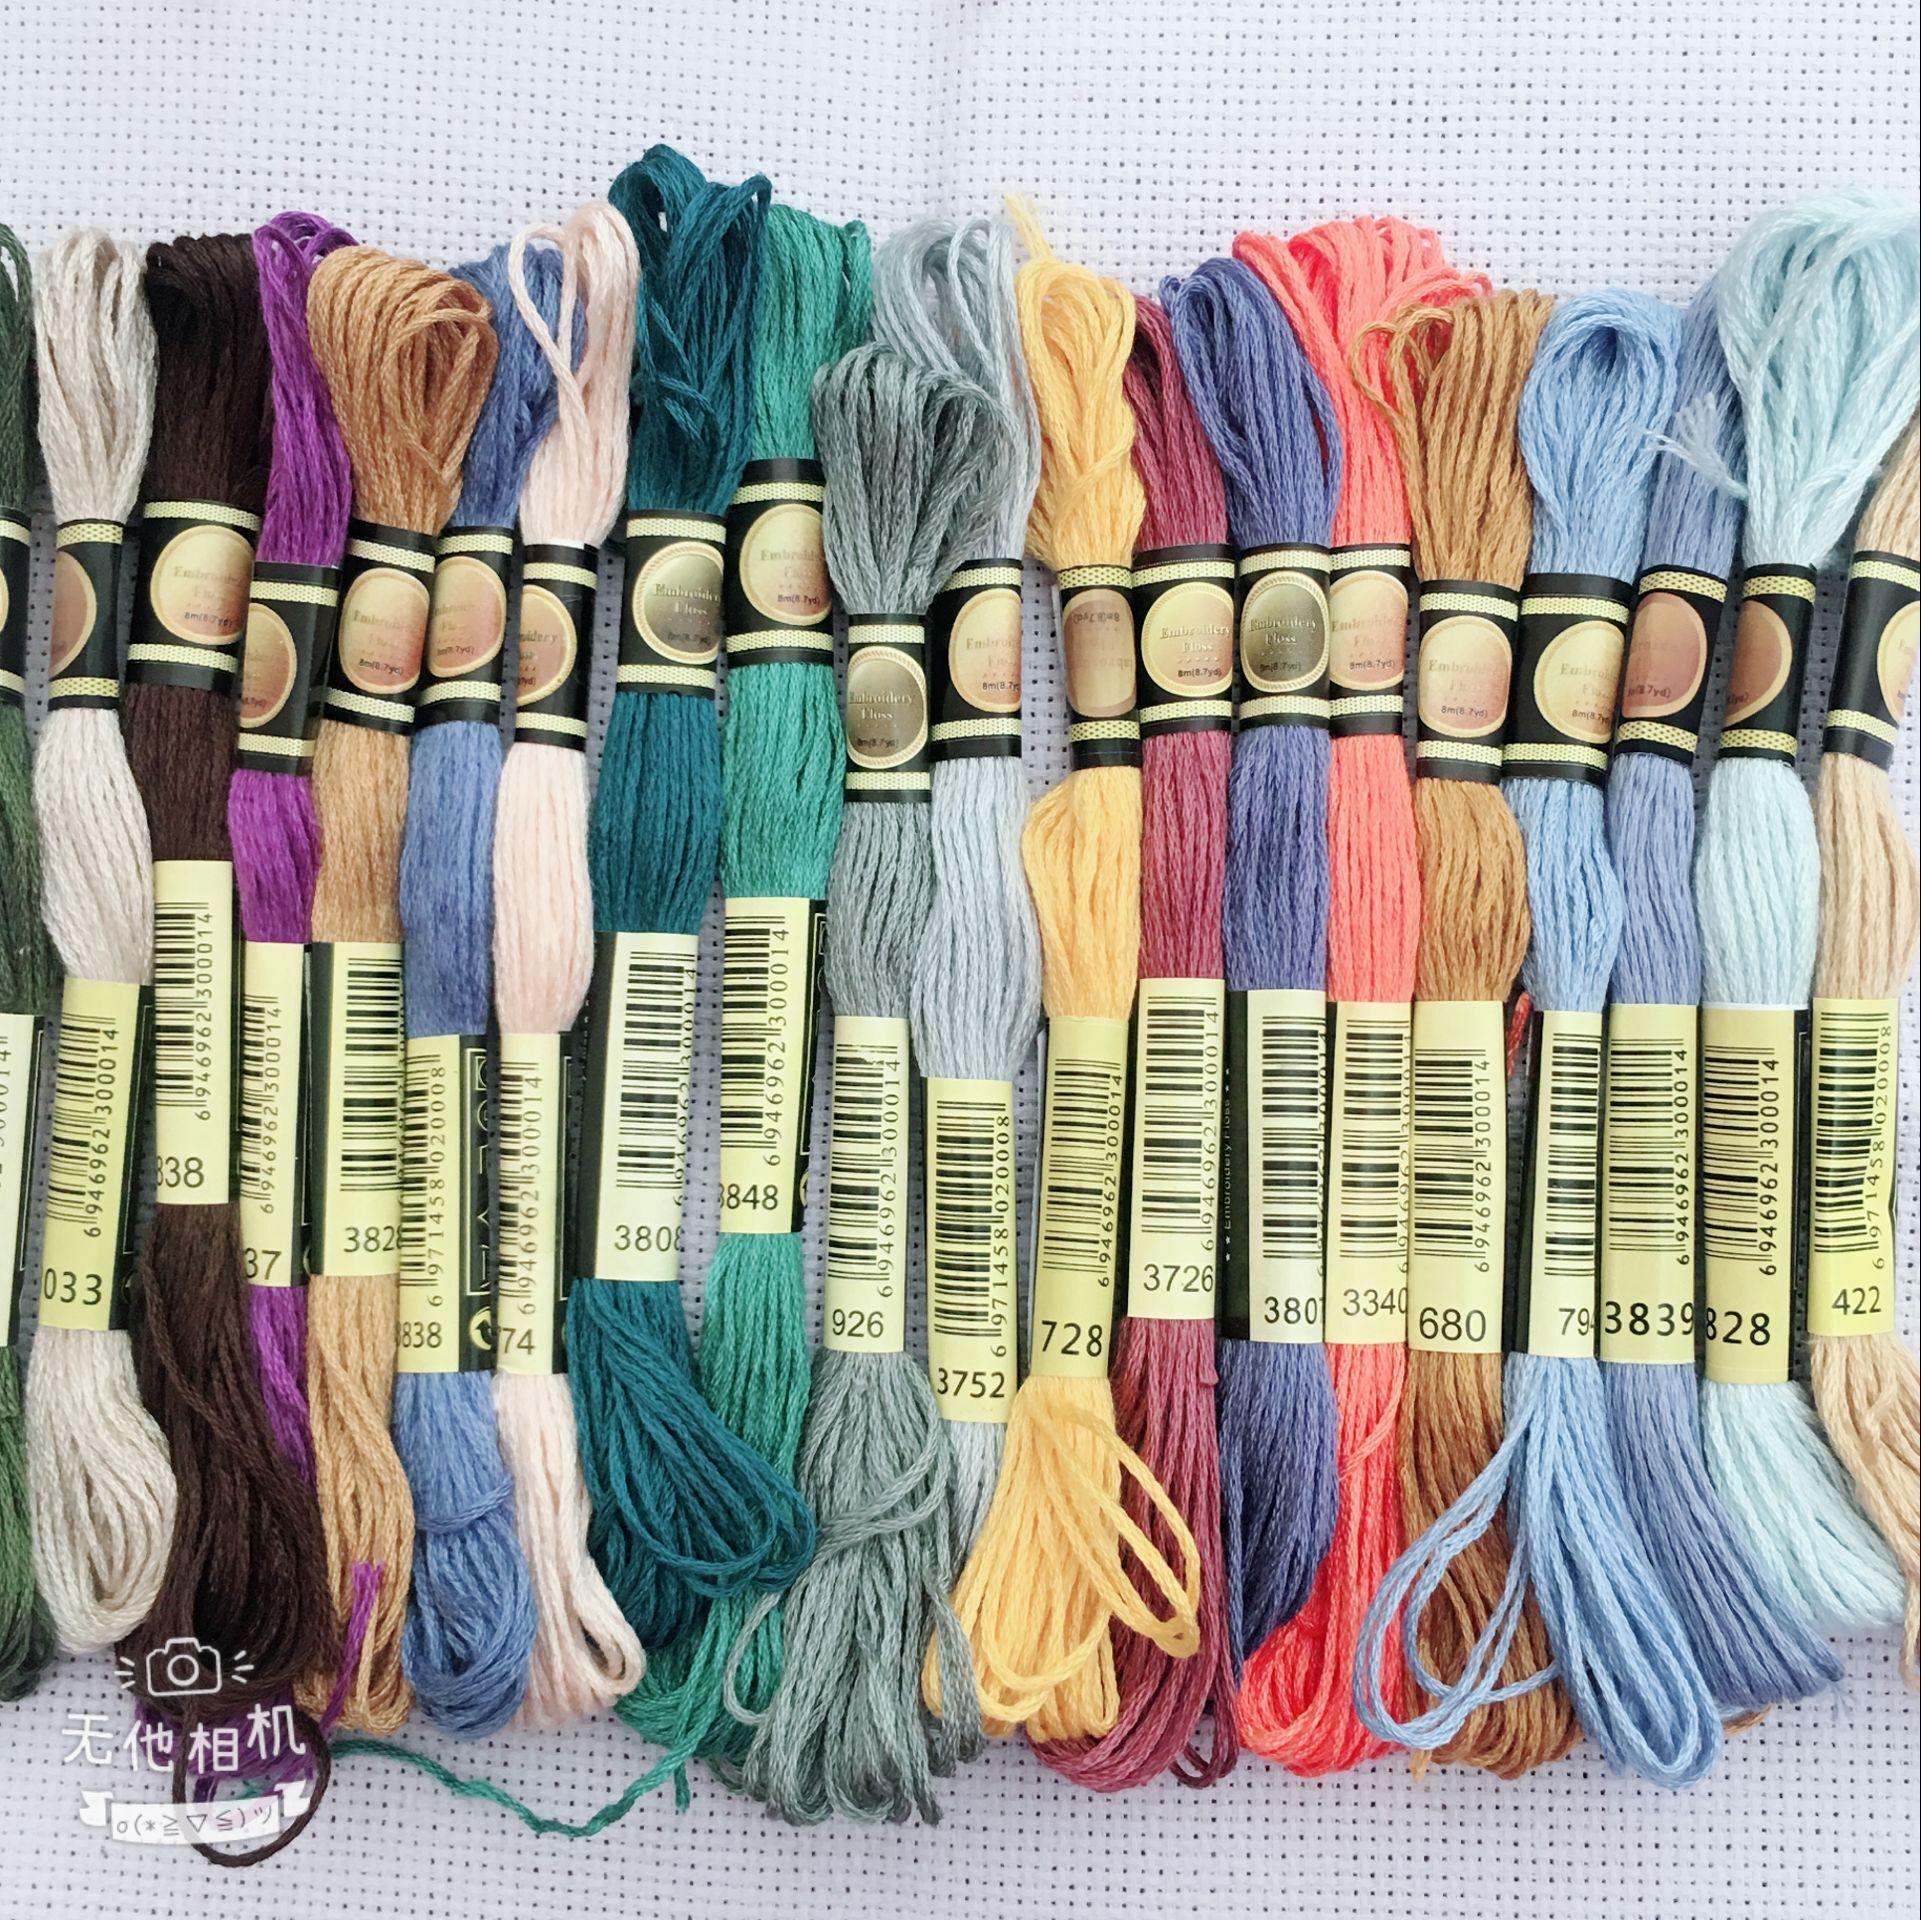 Pastel Anchor Cotton Thread Skeins cross stitch 12 demanding Various Colors